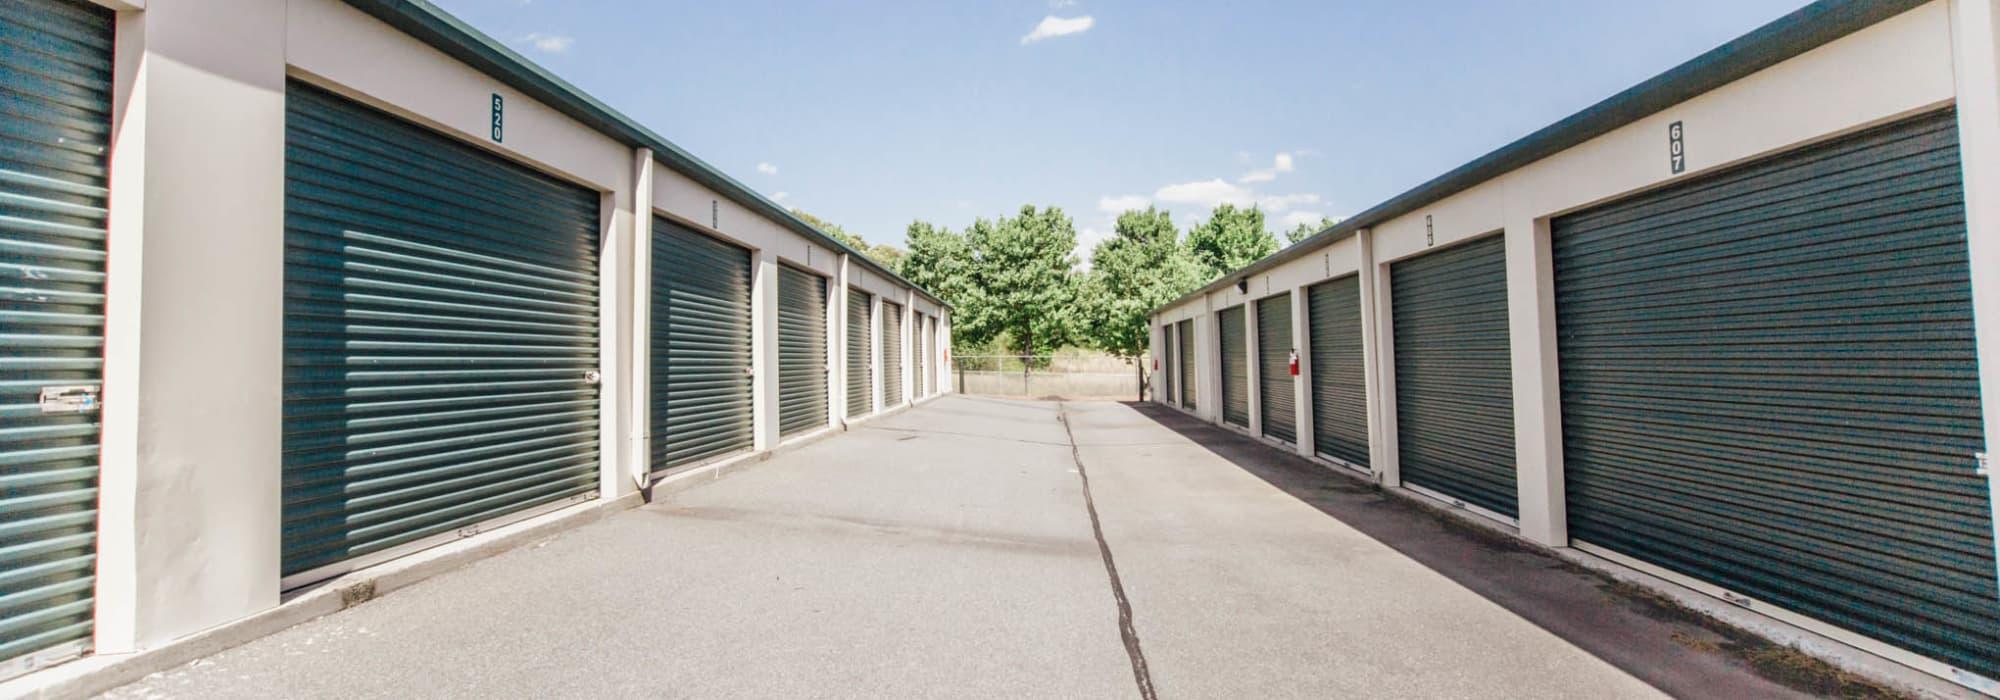 Harrisburg Nc Self Storage Near Unc Charlotte